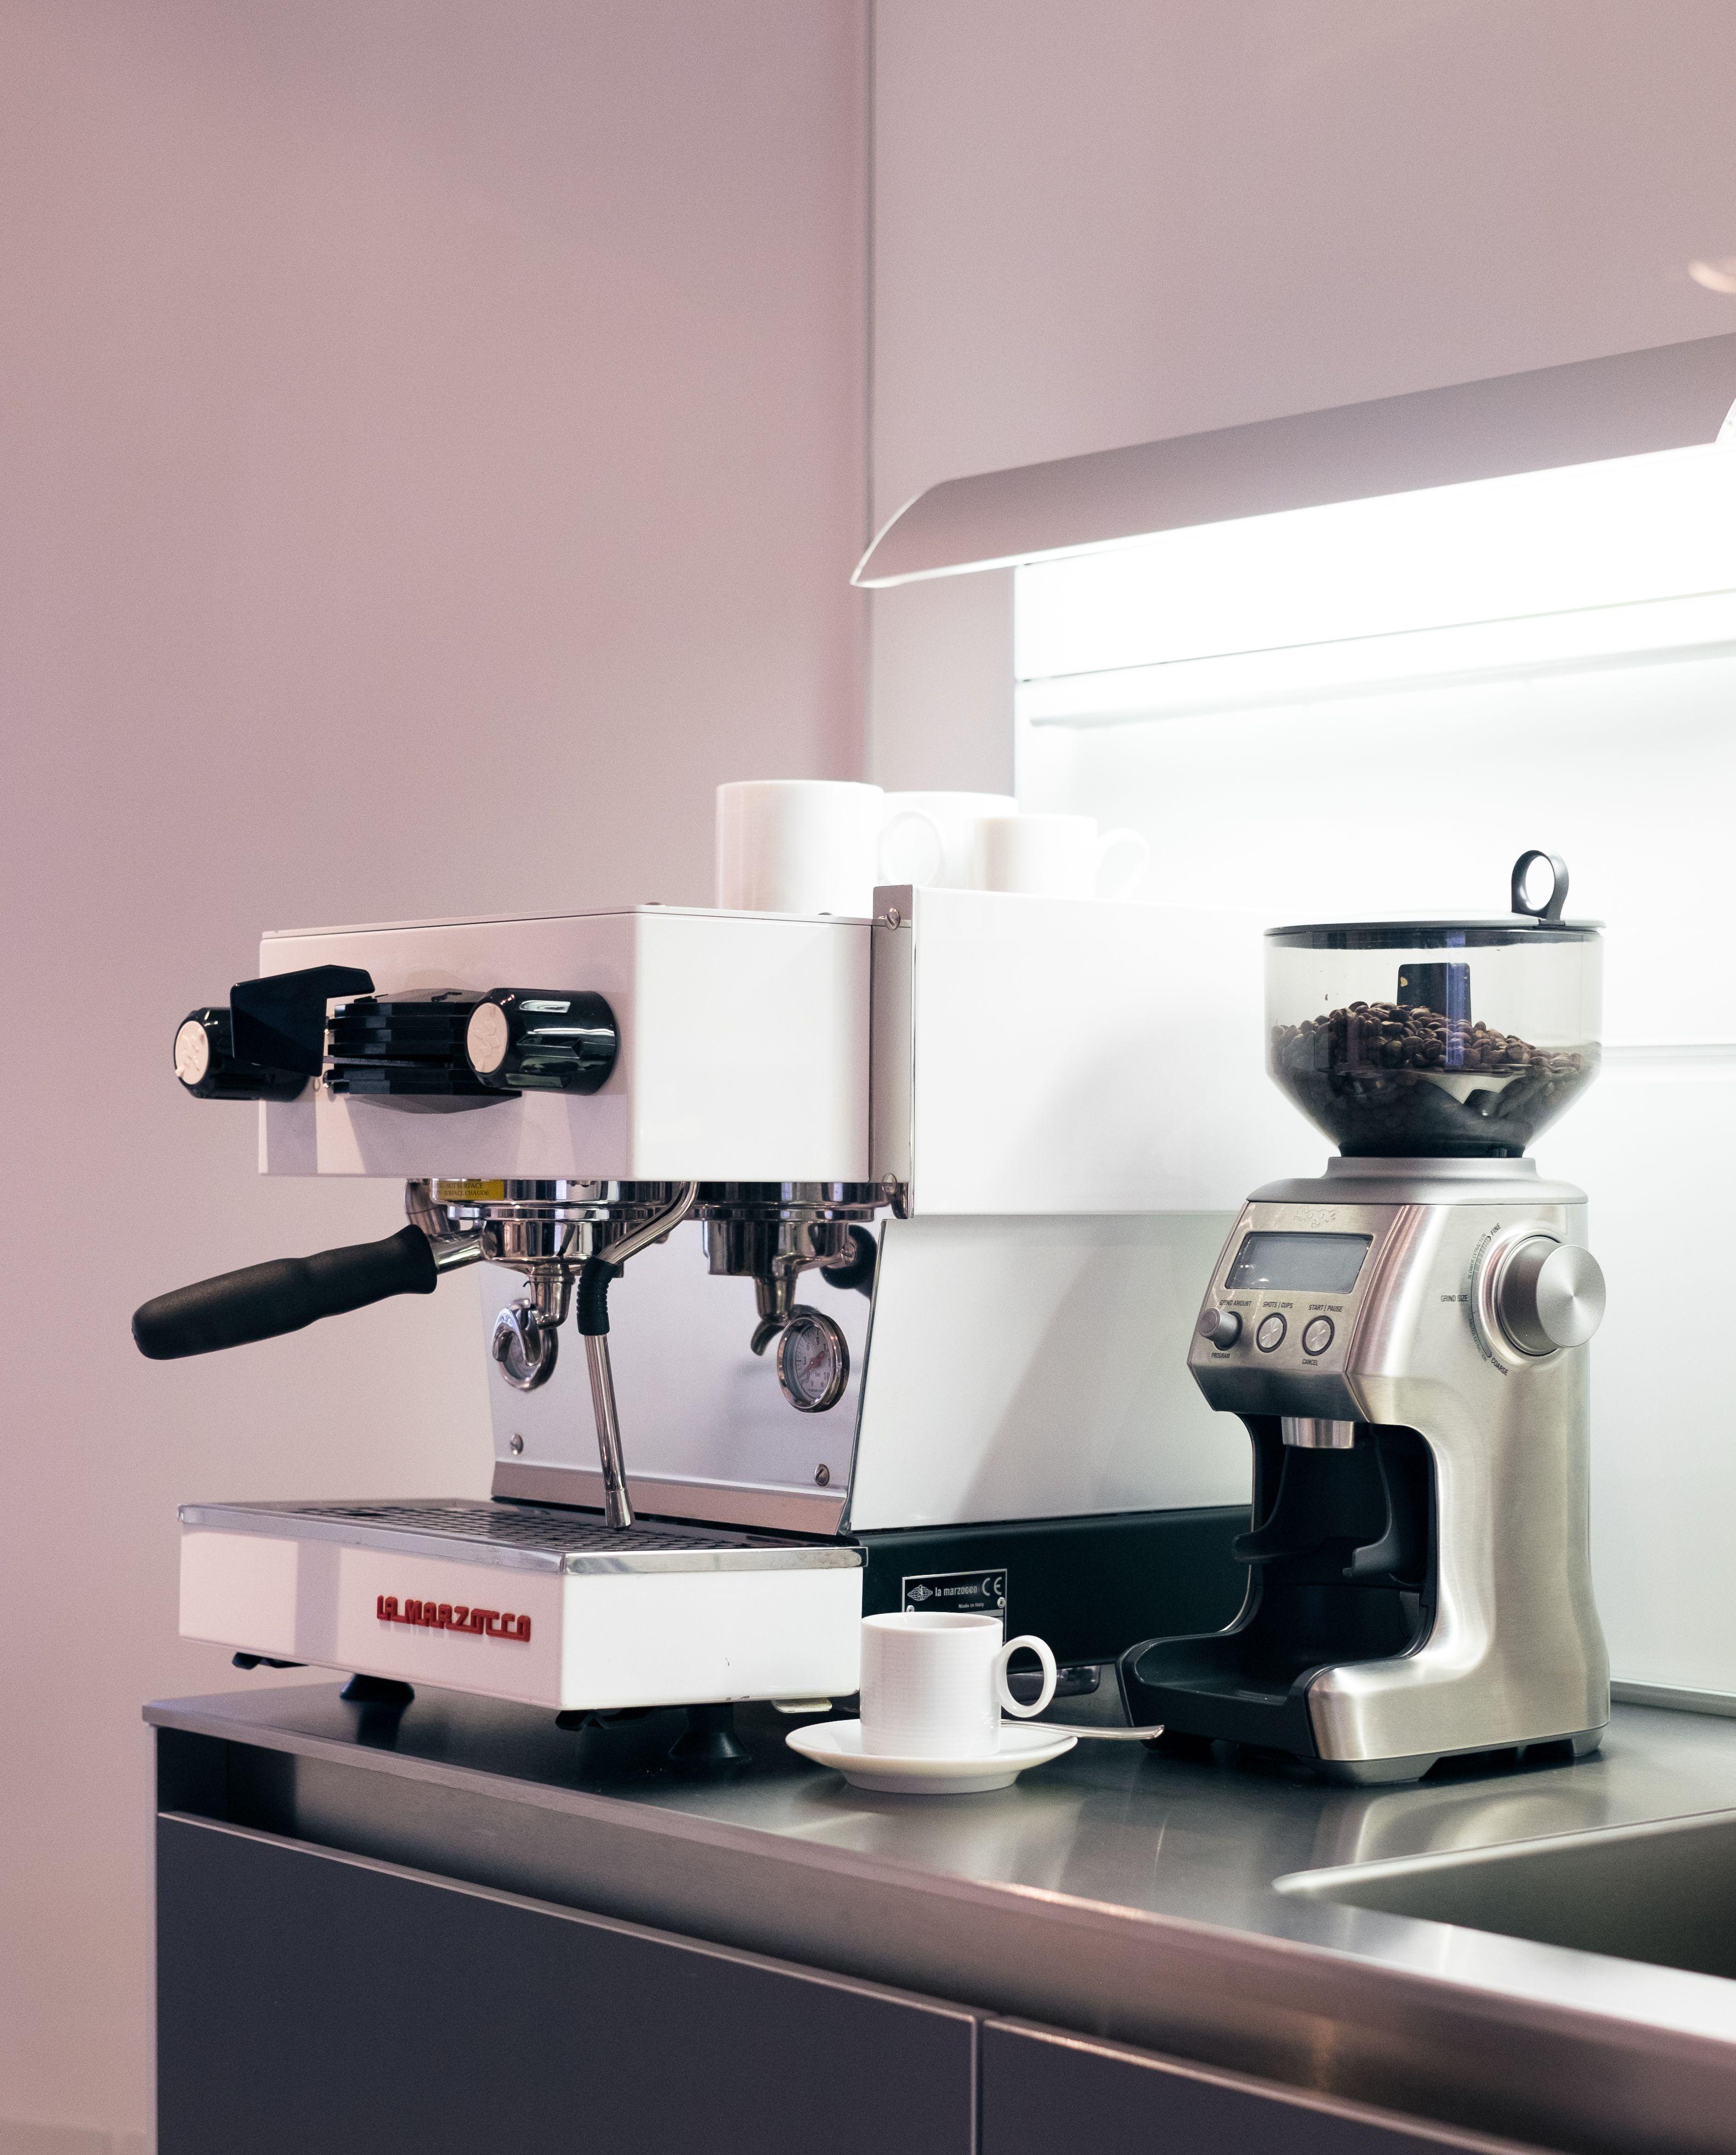 Home Espresso machine Home espresso machine, Coffee